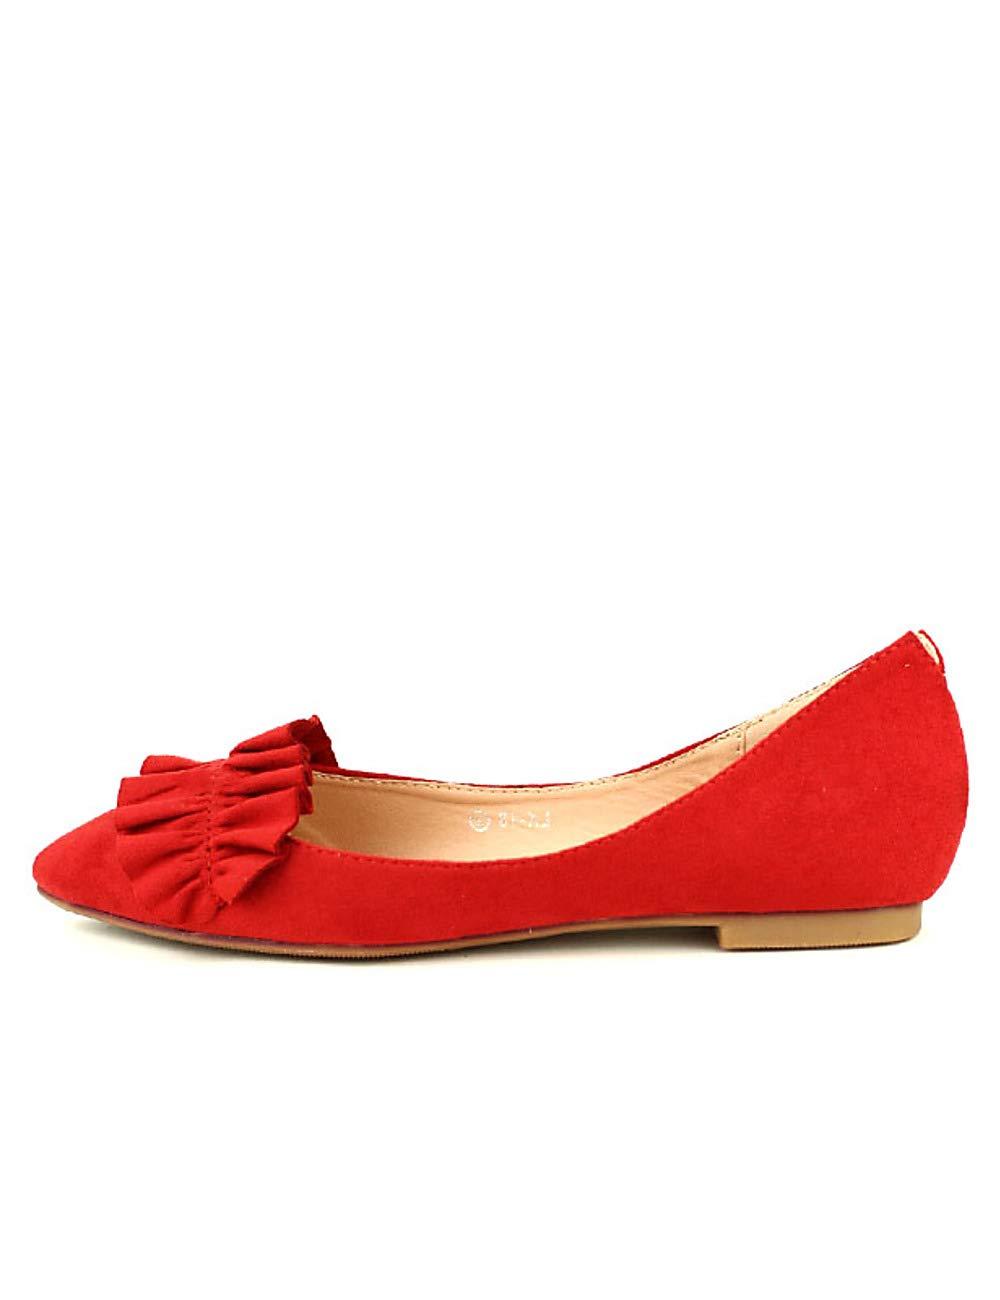 Cendriyon, Ballerines LOV Rouge LOV IT Chaussures Femme Cendriyon, Femme Rouge 7bab752 - digitalweb.space